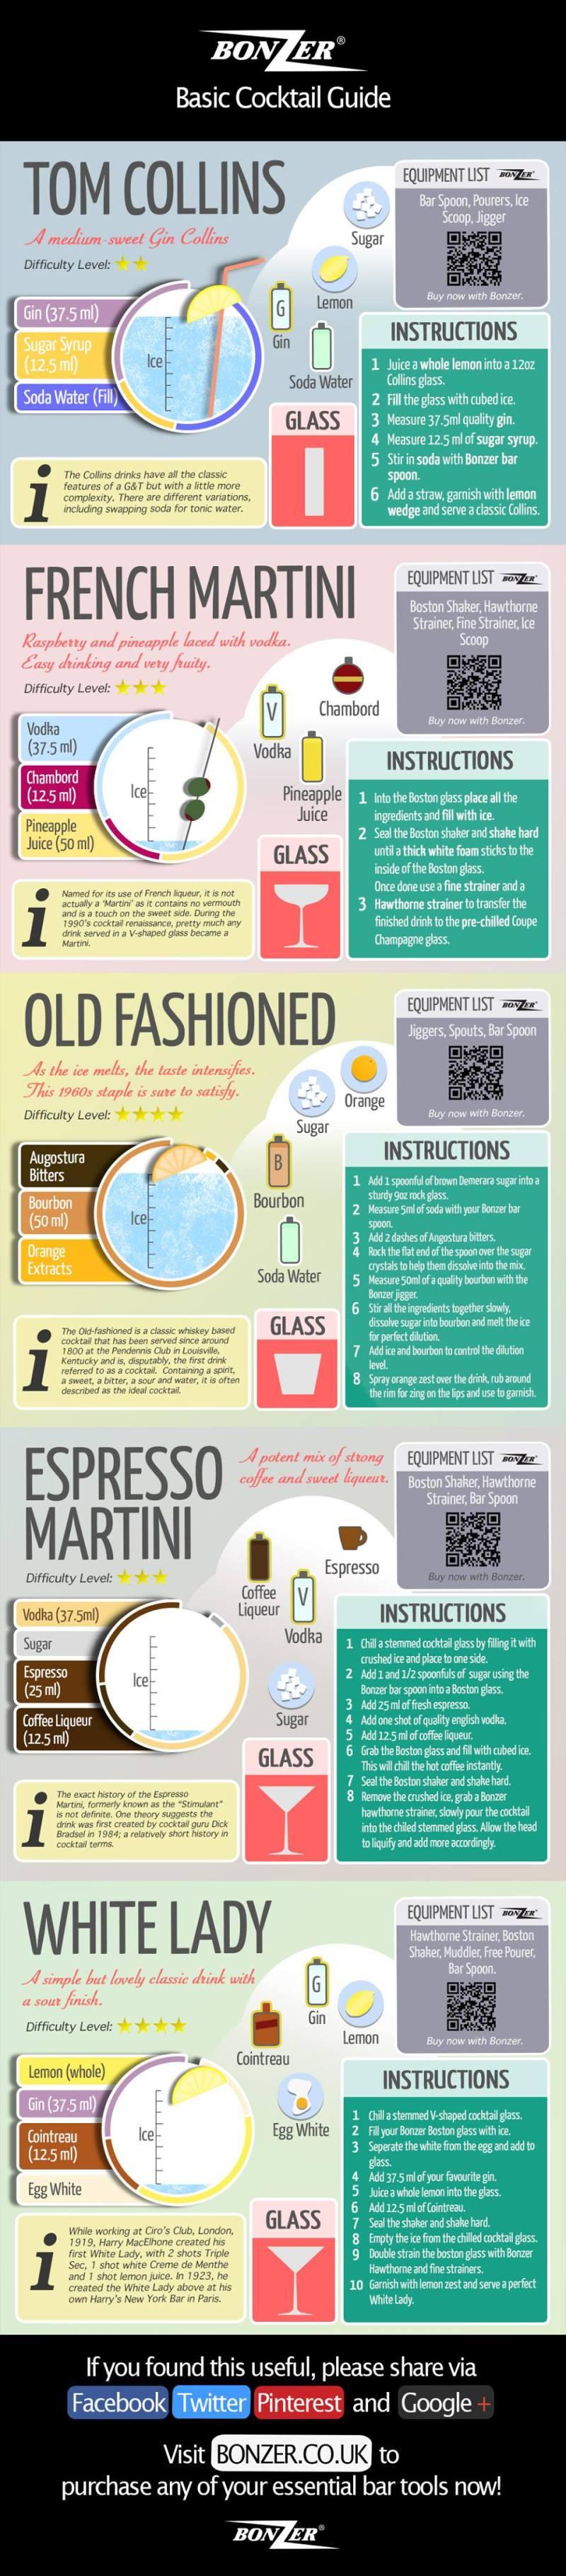 bonzer-cocktail-infographic